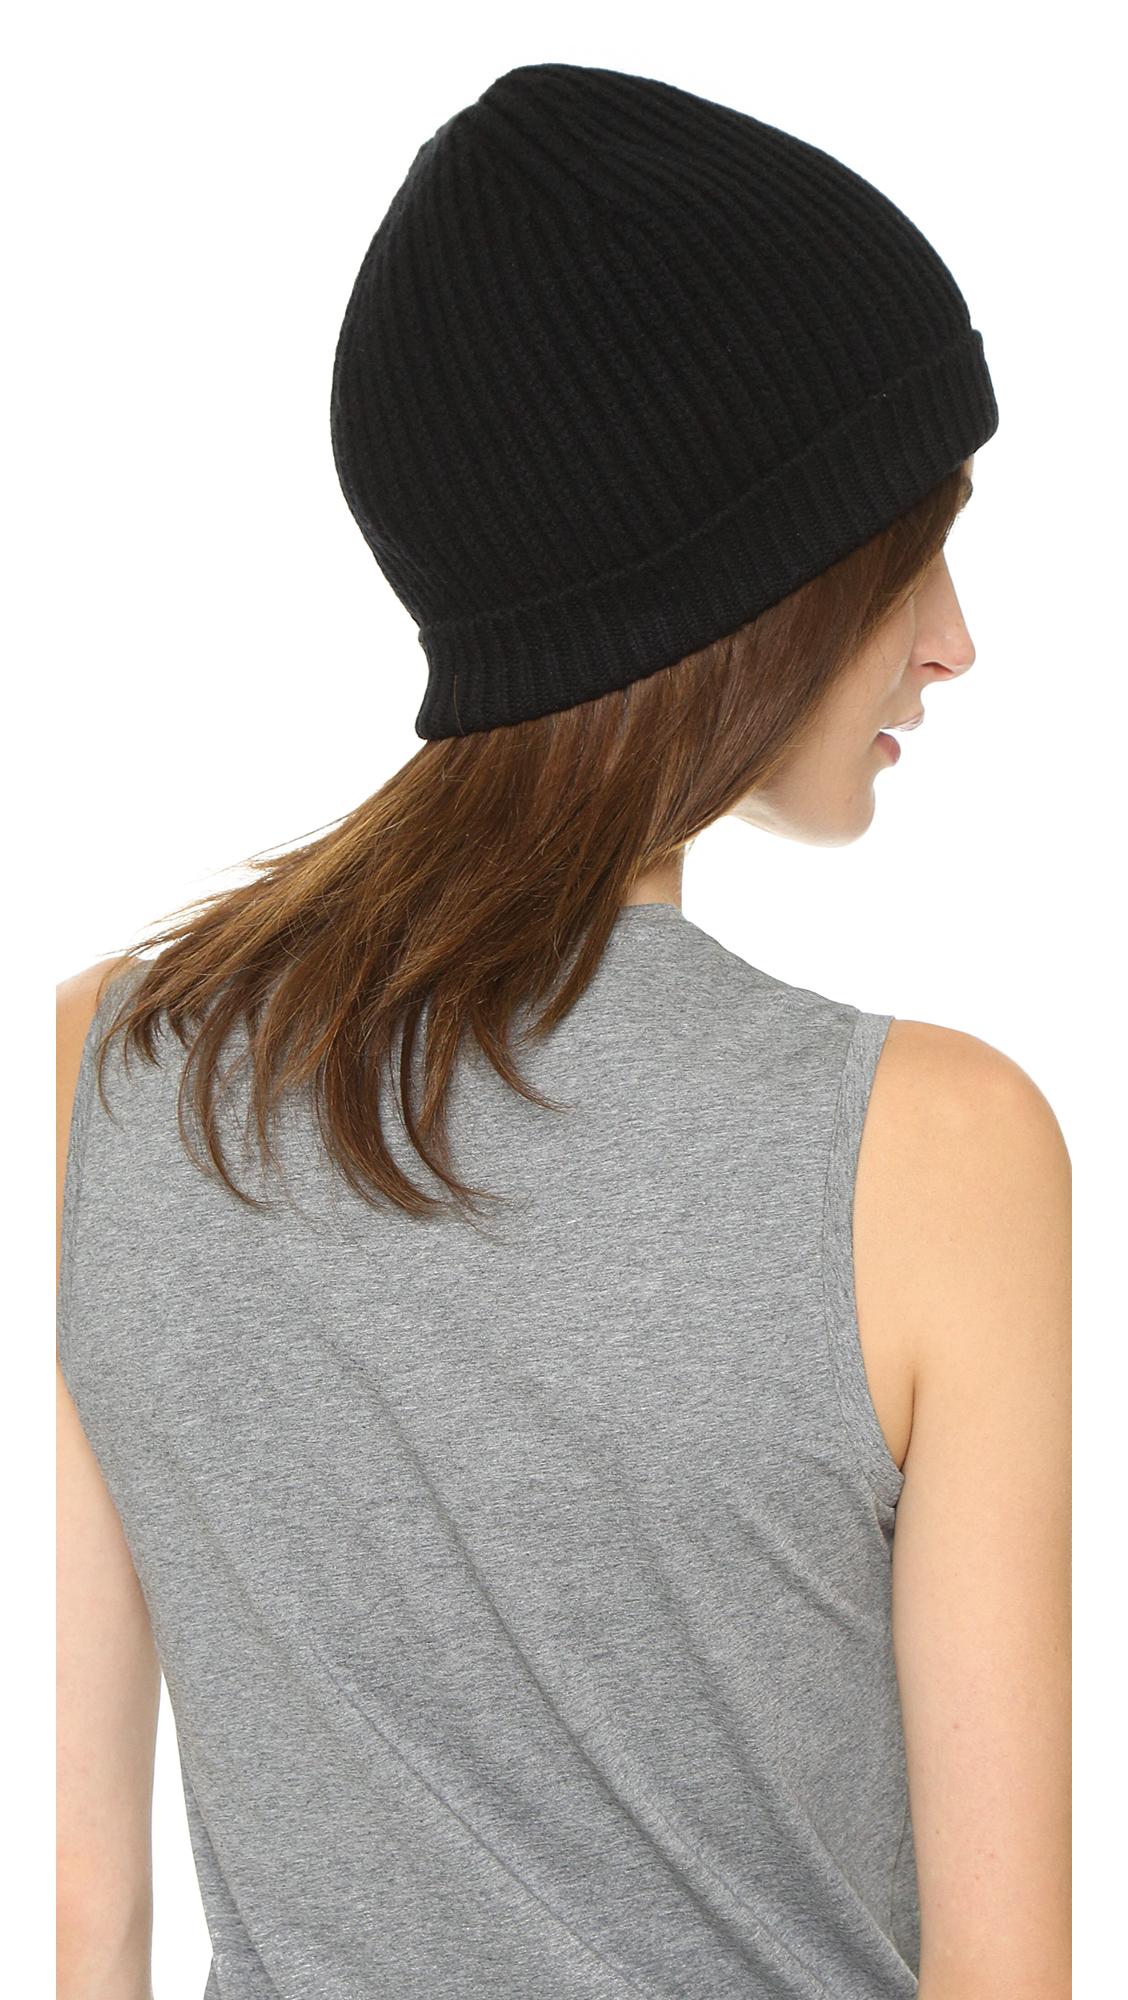 1498393d3ad4 Acne studios Canning L Rib Hat in Black